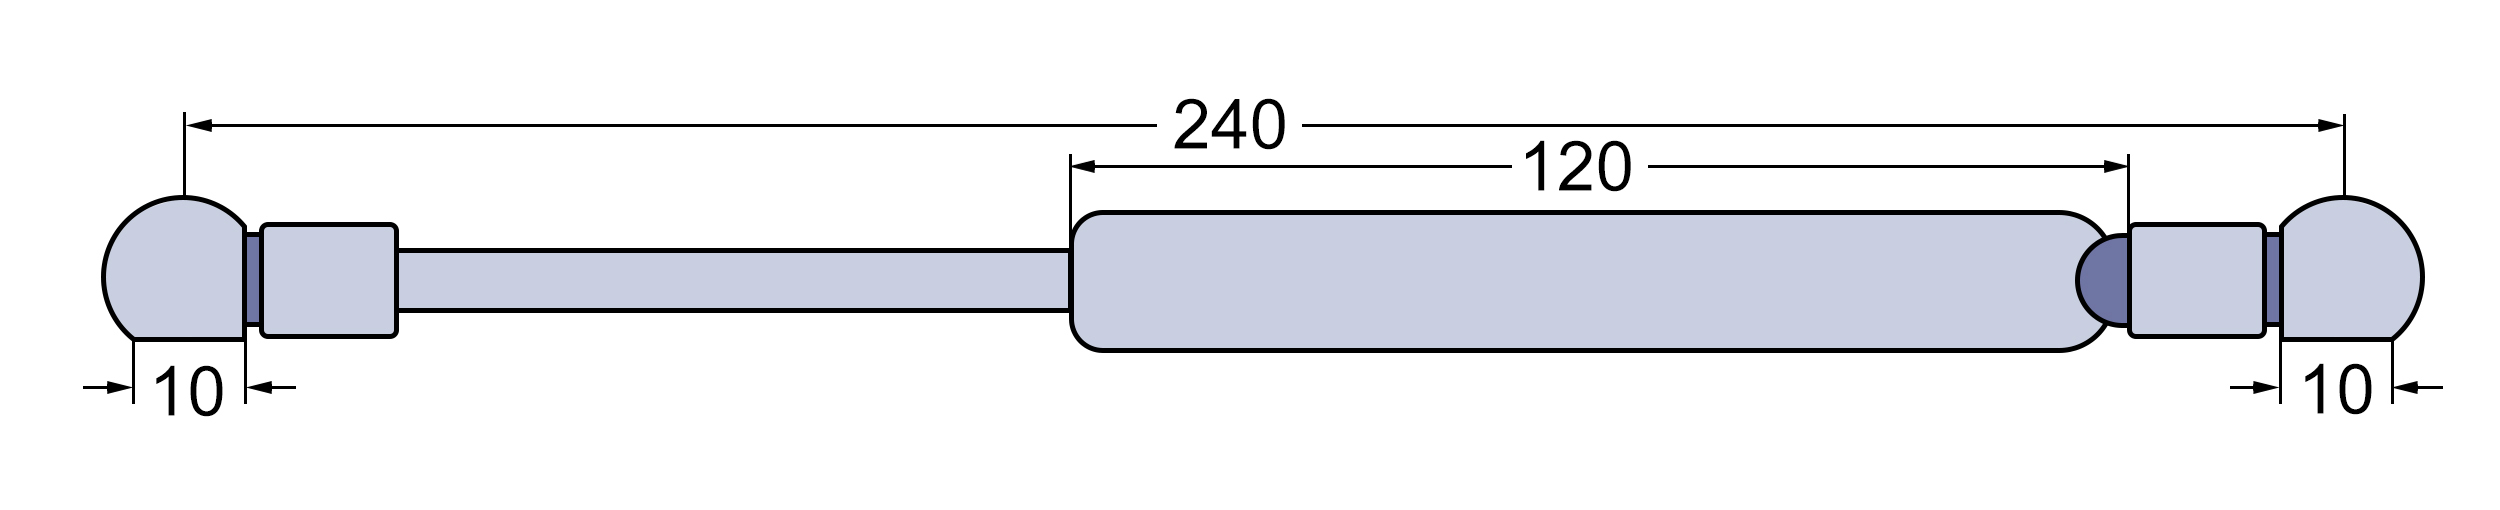 4Stk Druckfedern Drahtstärke=2,0mm OD = 14mm Stahlfedern Federn Edelstahl Neu